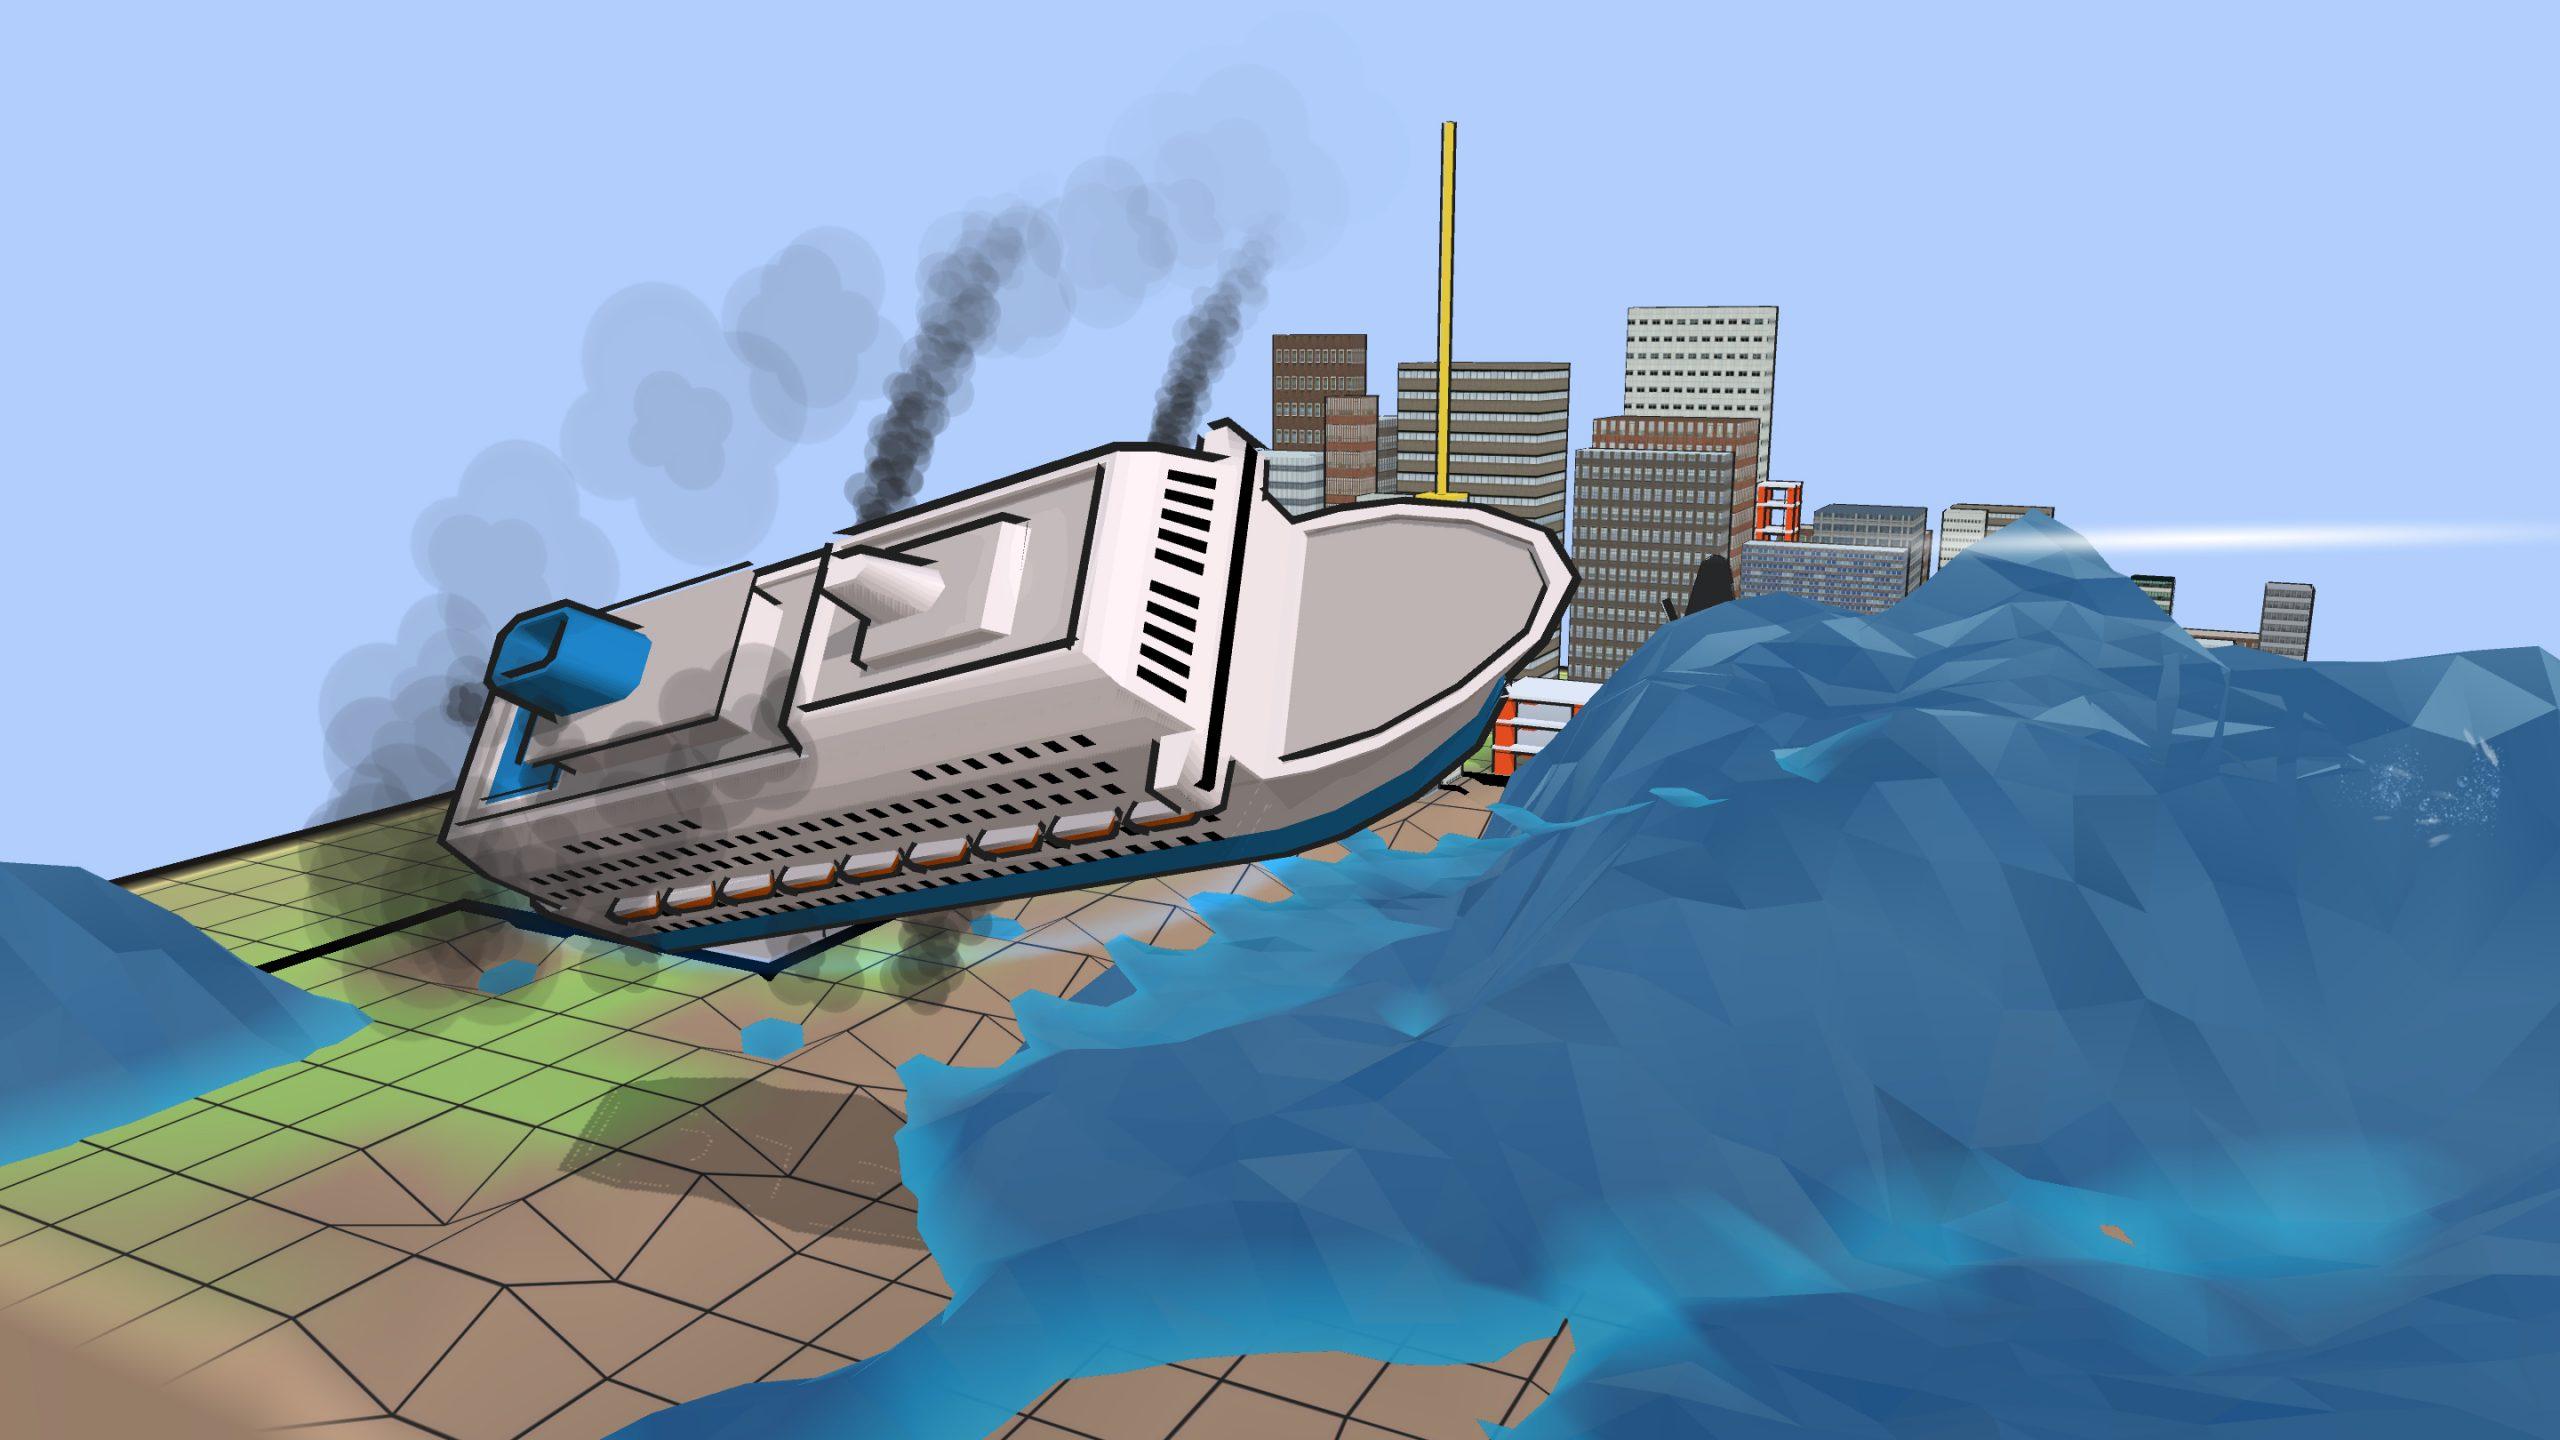 Defeat the dreaded Megastructures